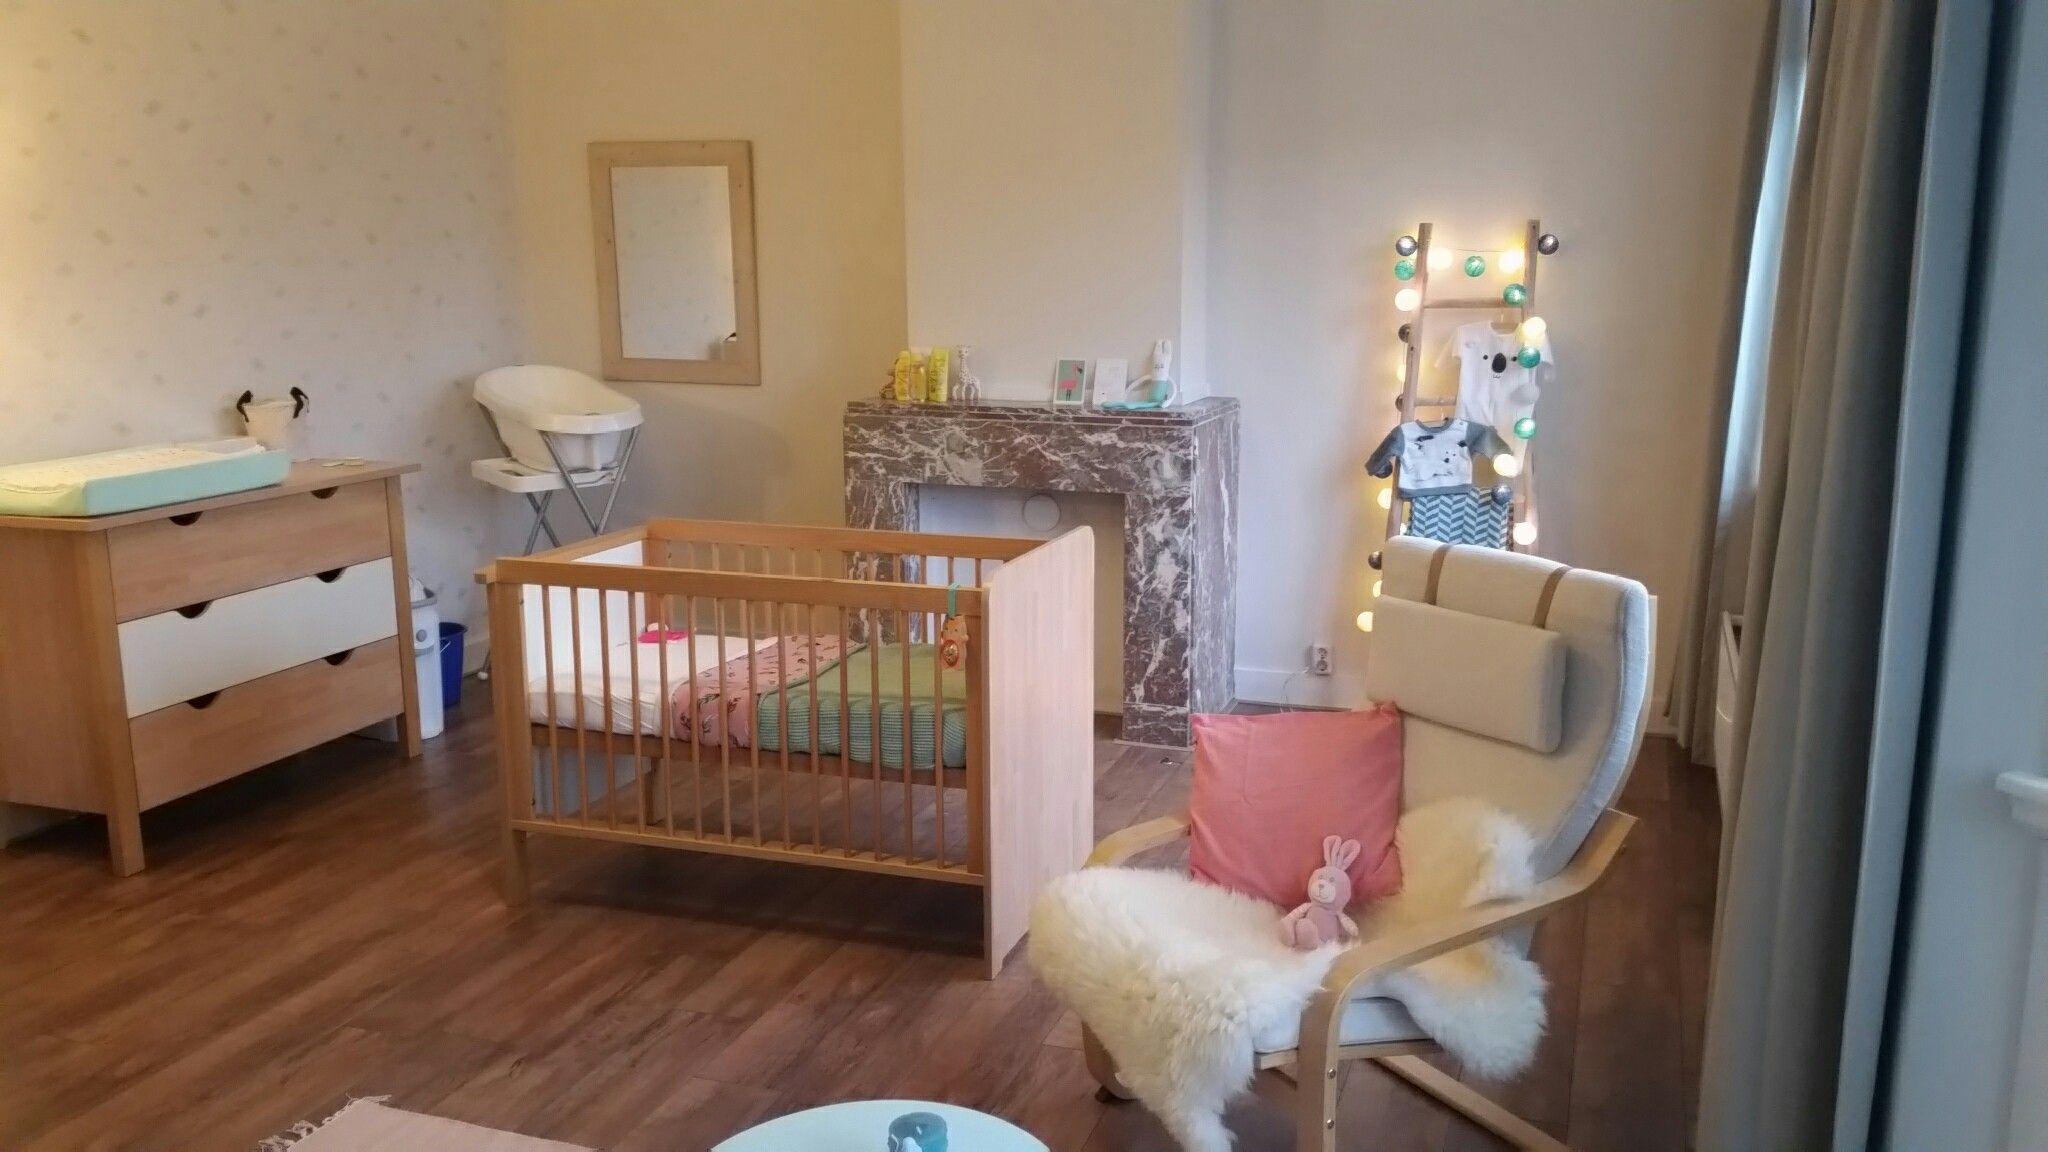 Stijlvolle Speeltafel Kinderkamer : Babykamer #commode #wolkjesbehang #spiegel #decoladder babykamer